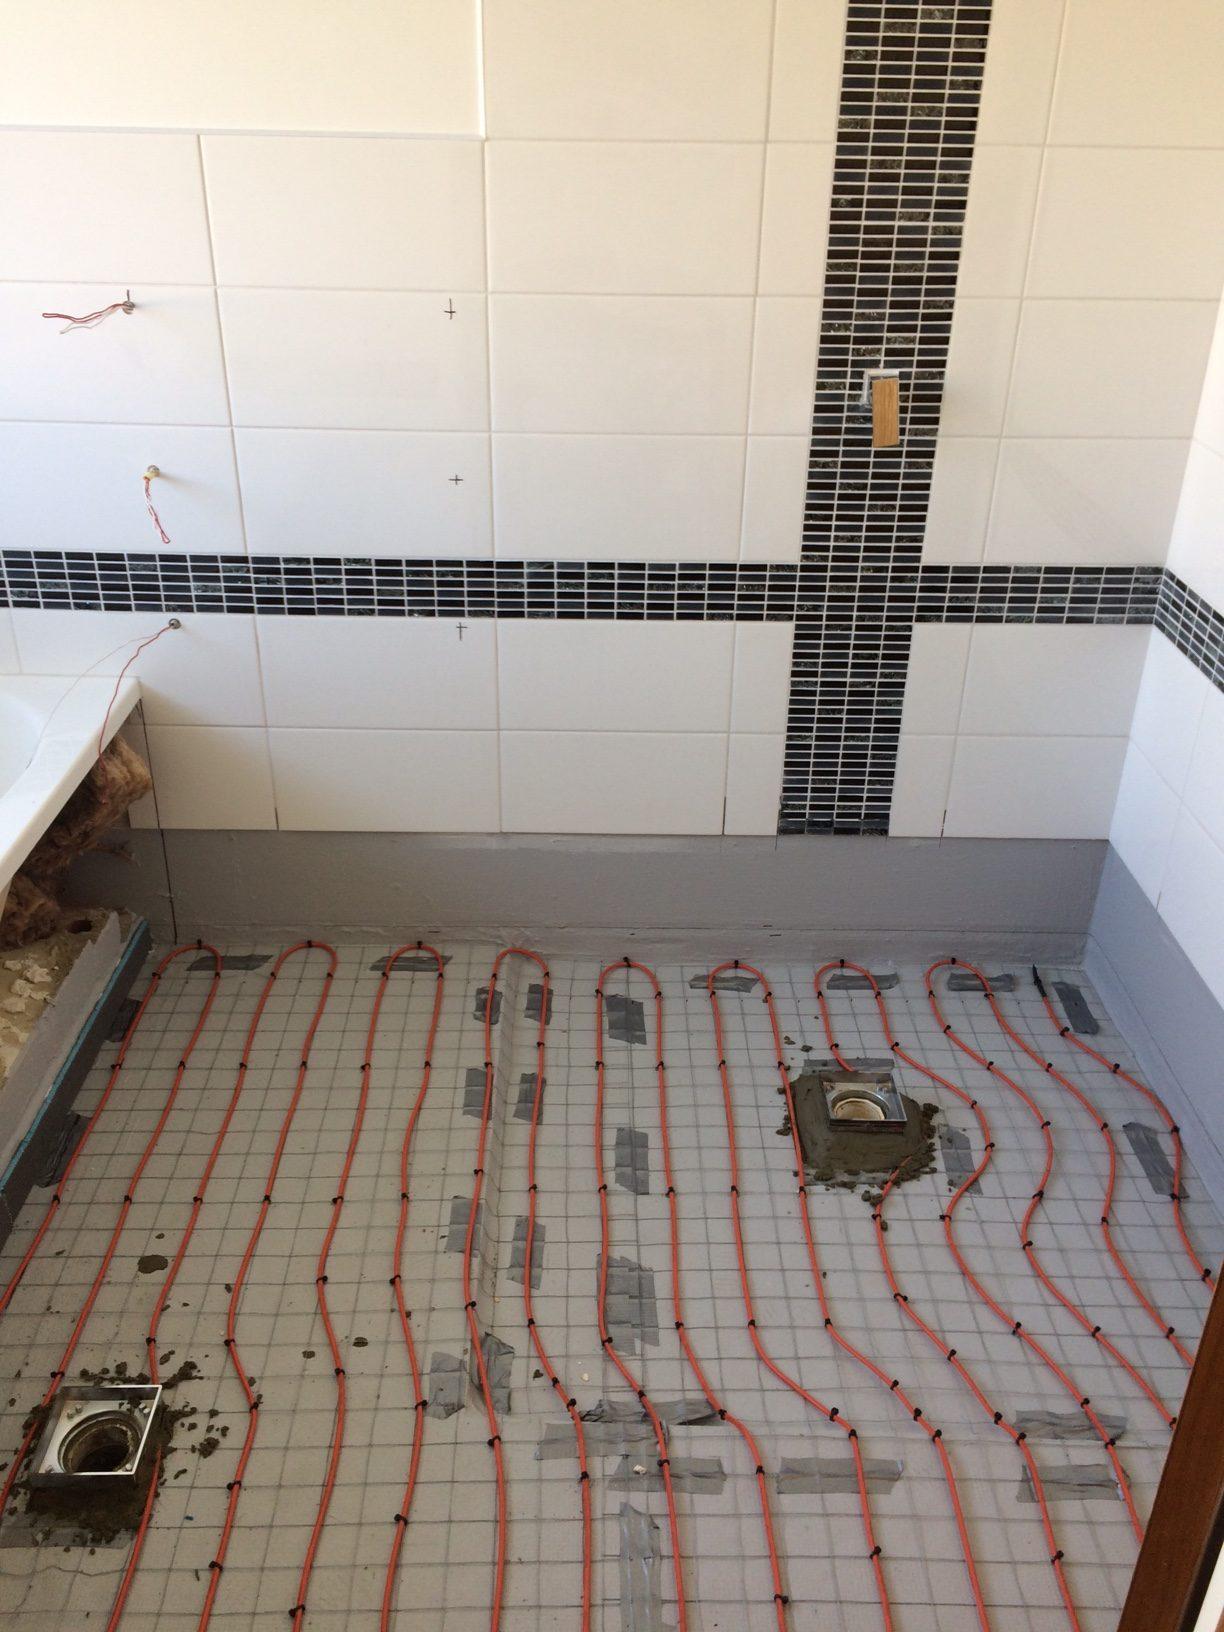 Underfloor heating in the bathroom